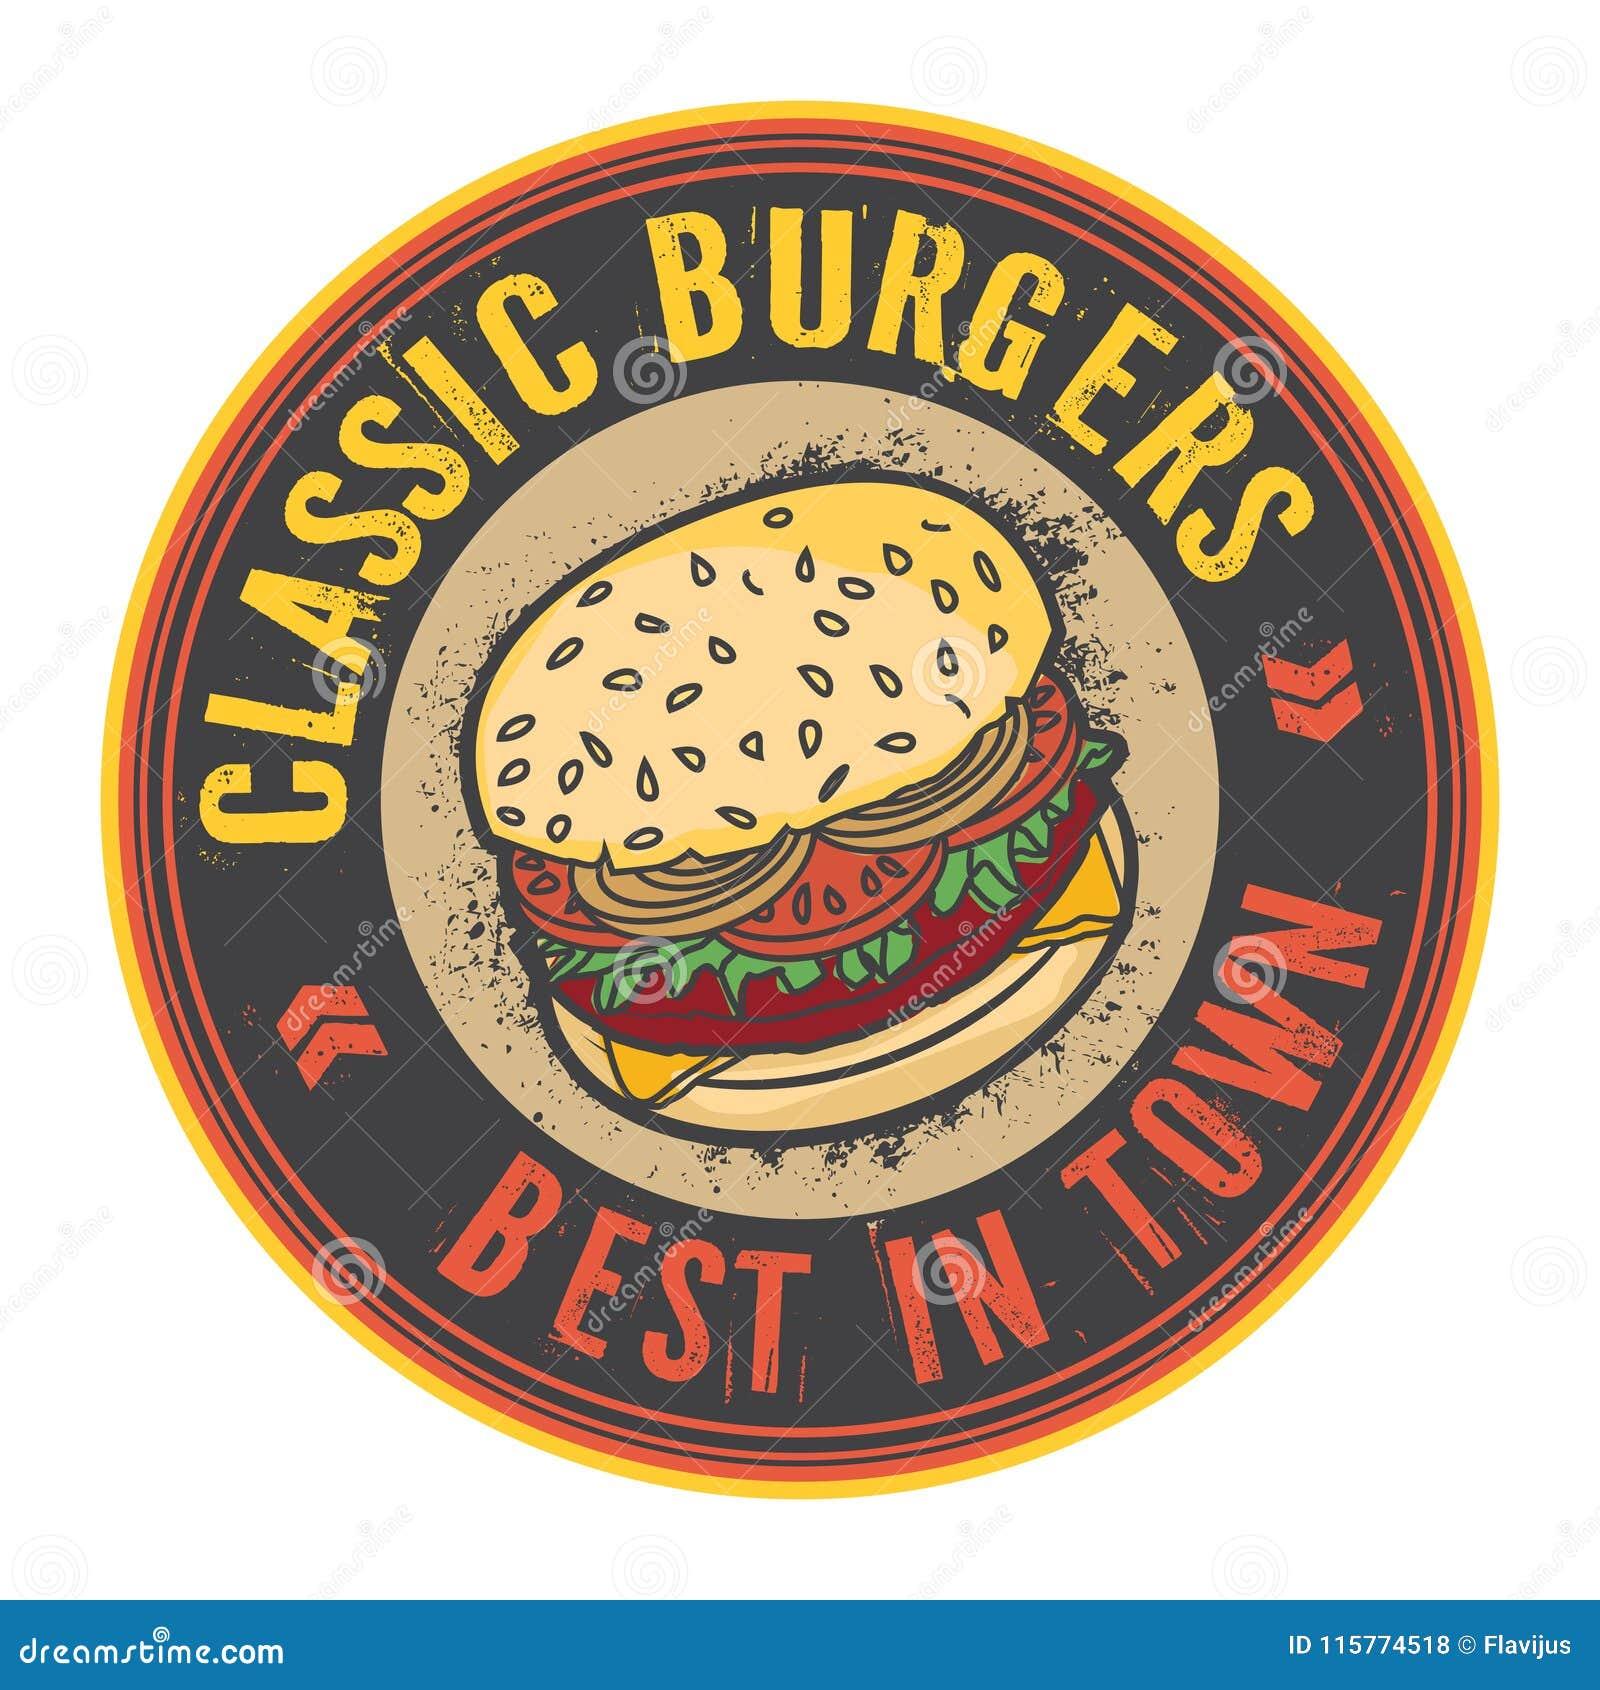 Timbre ou label avec le grand hamburger